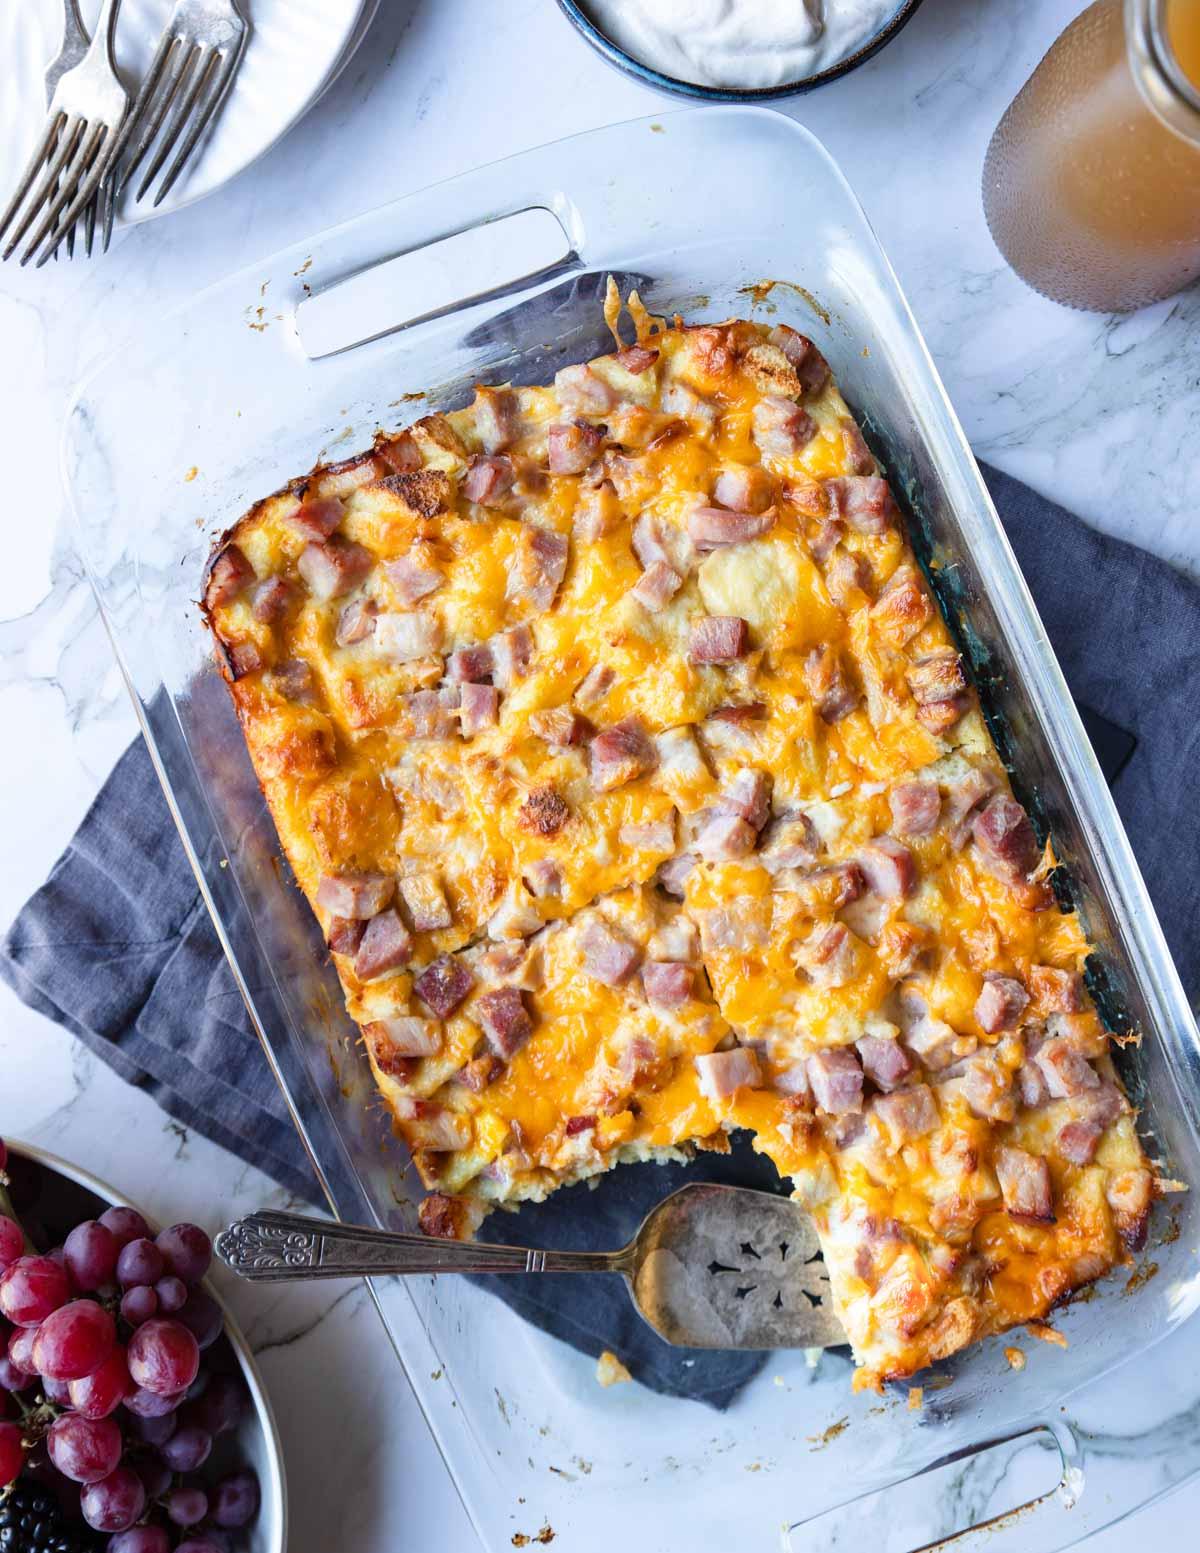 9x13 baking dish with ham breakfast casserole